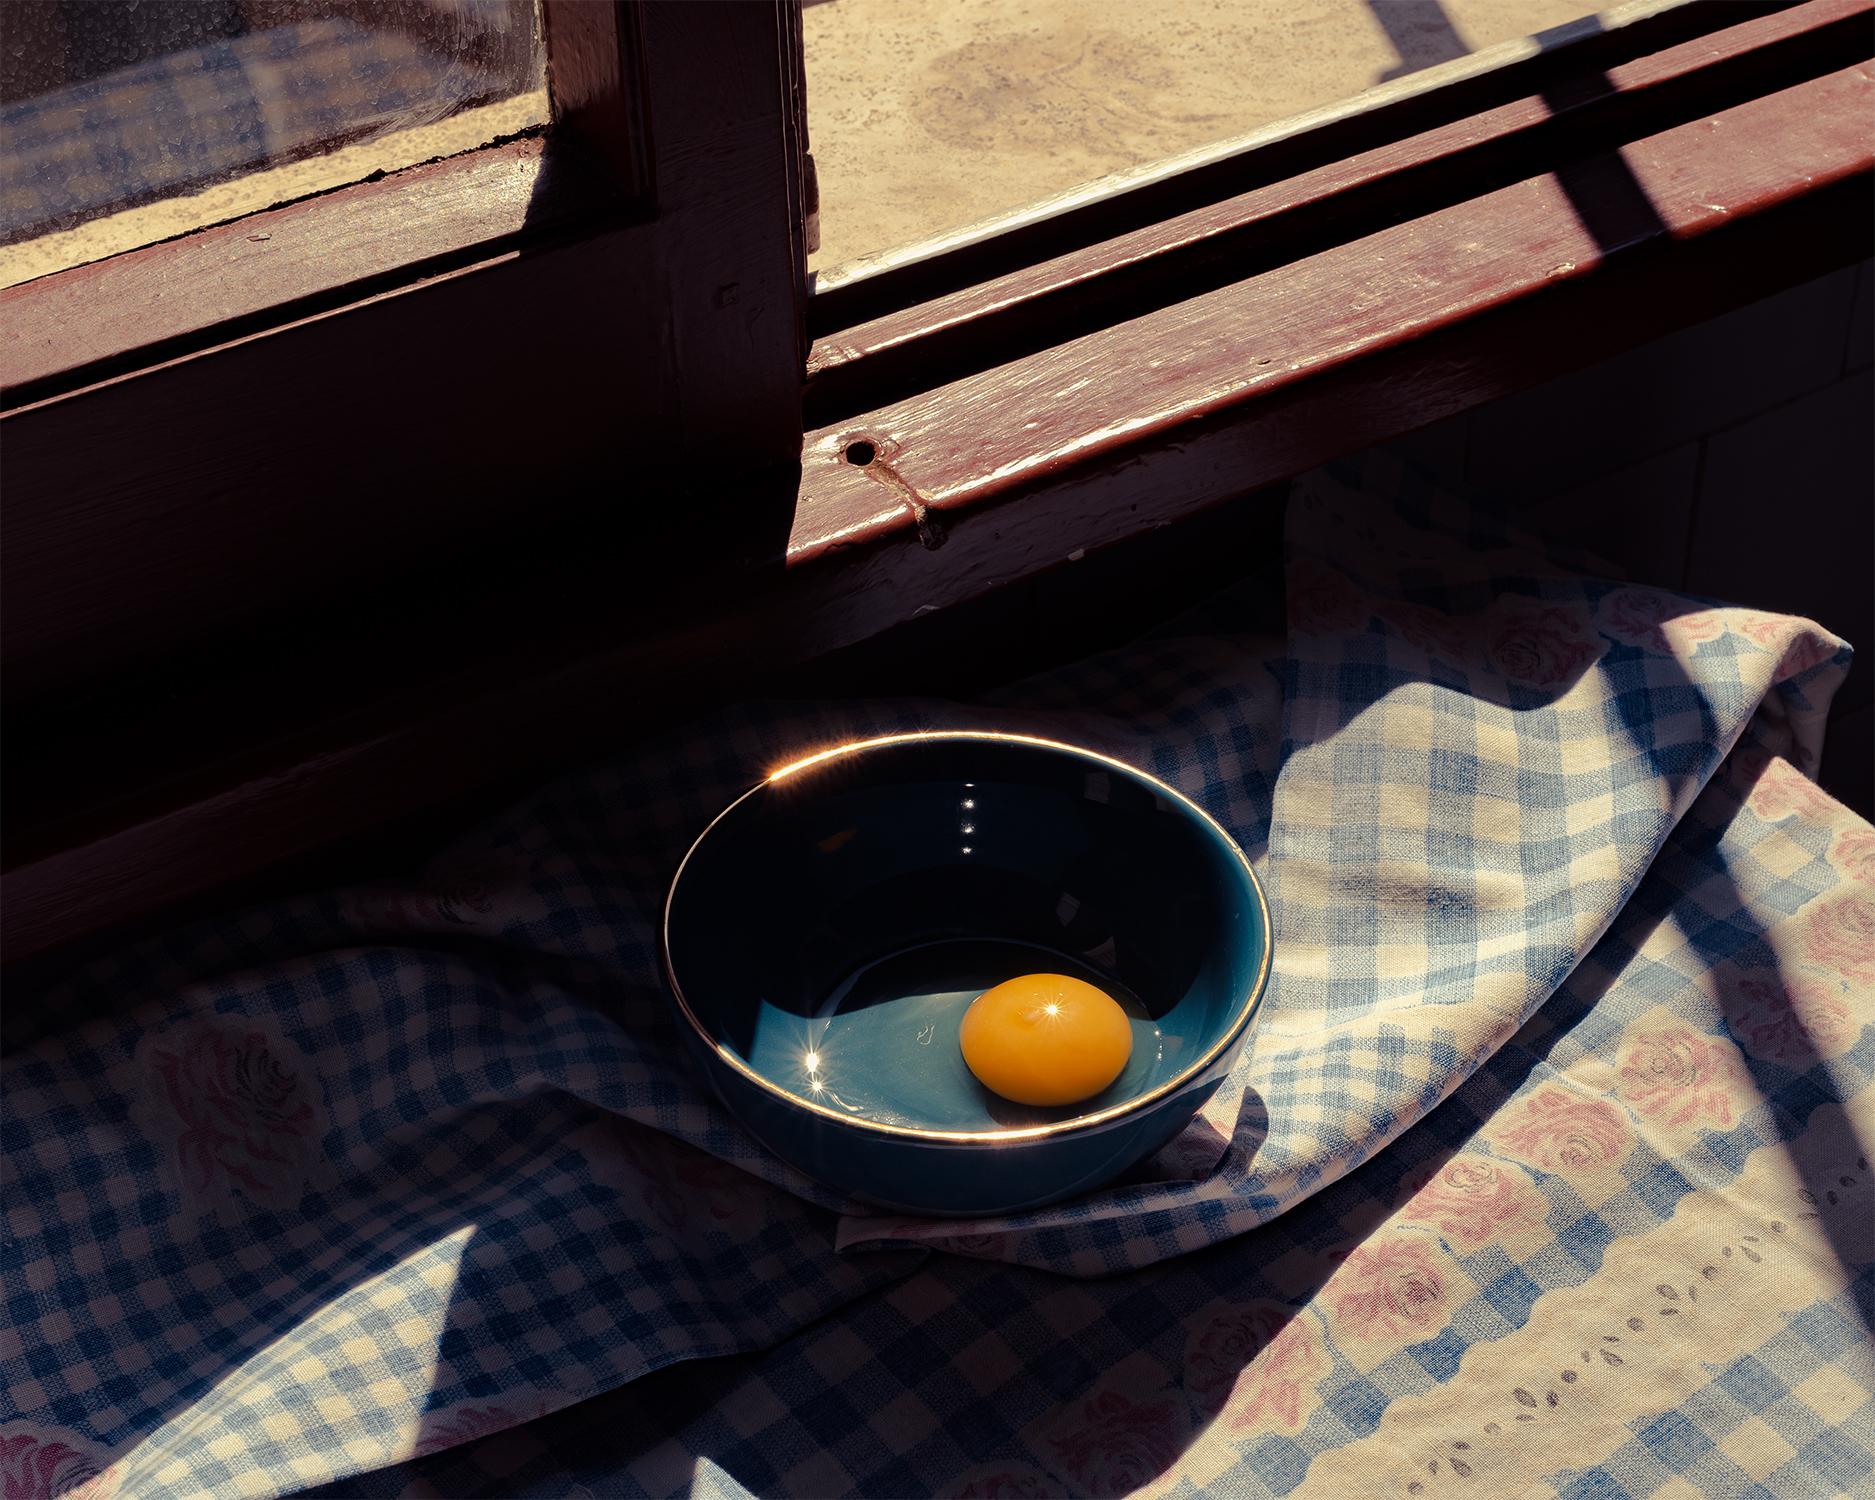 © Alessio Pellicoro - Dear Diary, this is my quarantine